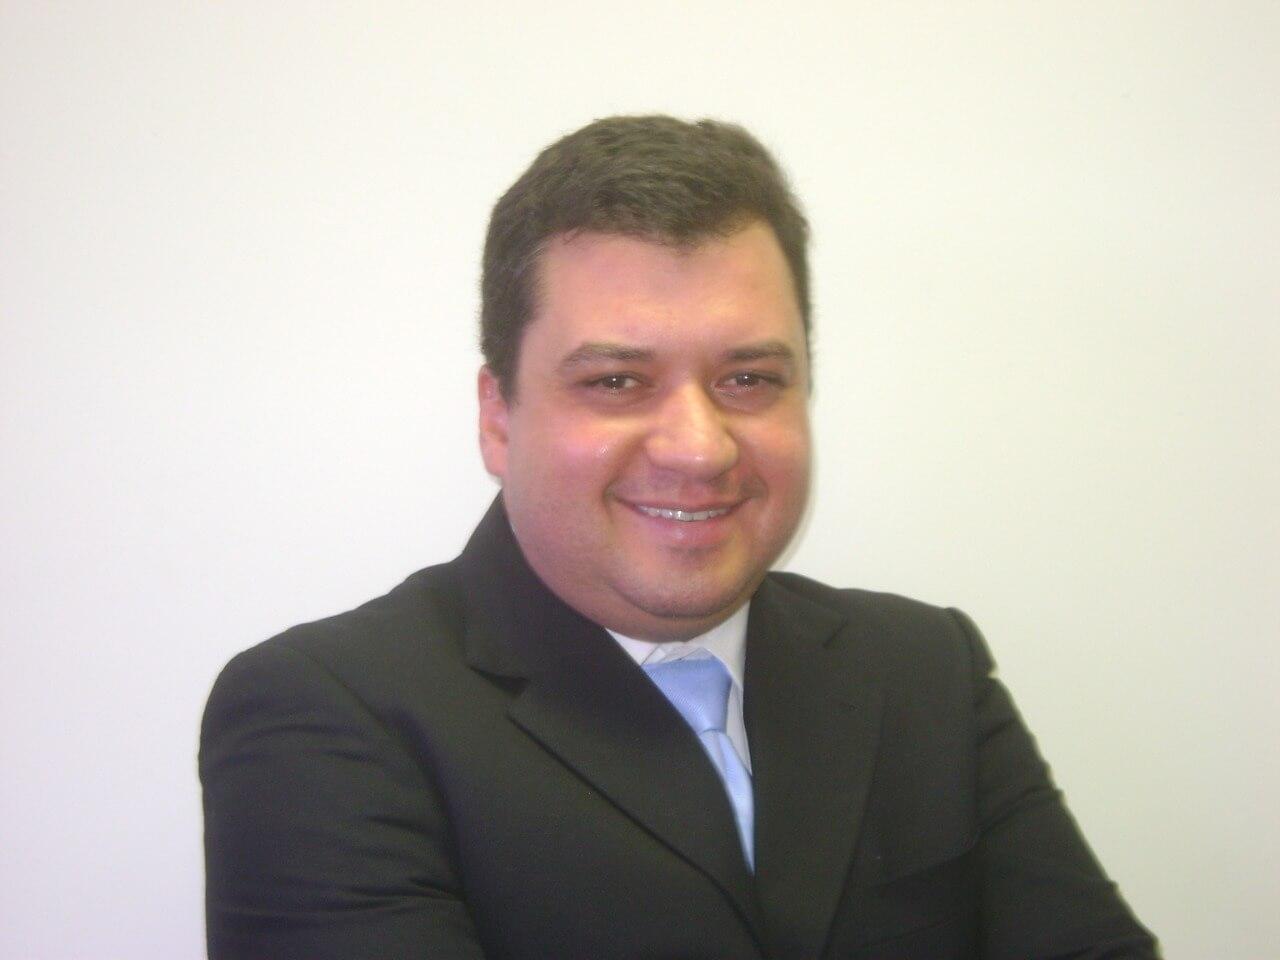 Eng. Rubens Monge Silveira